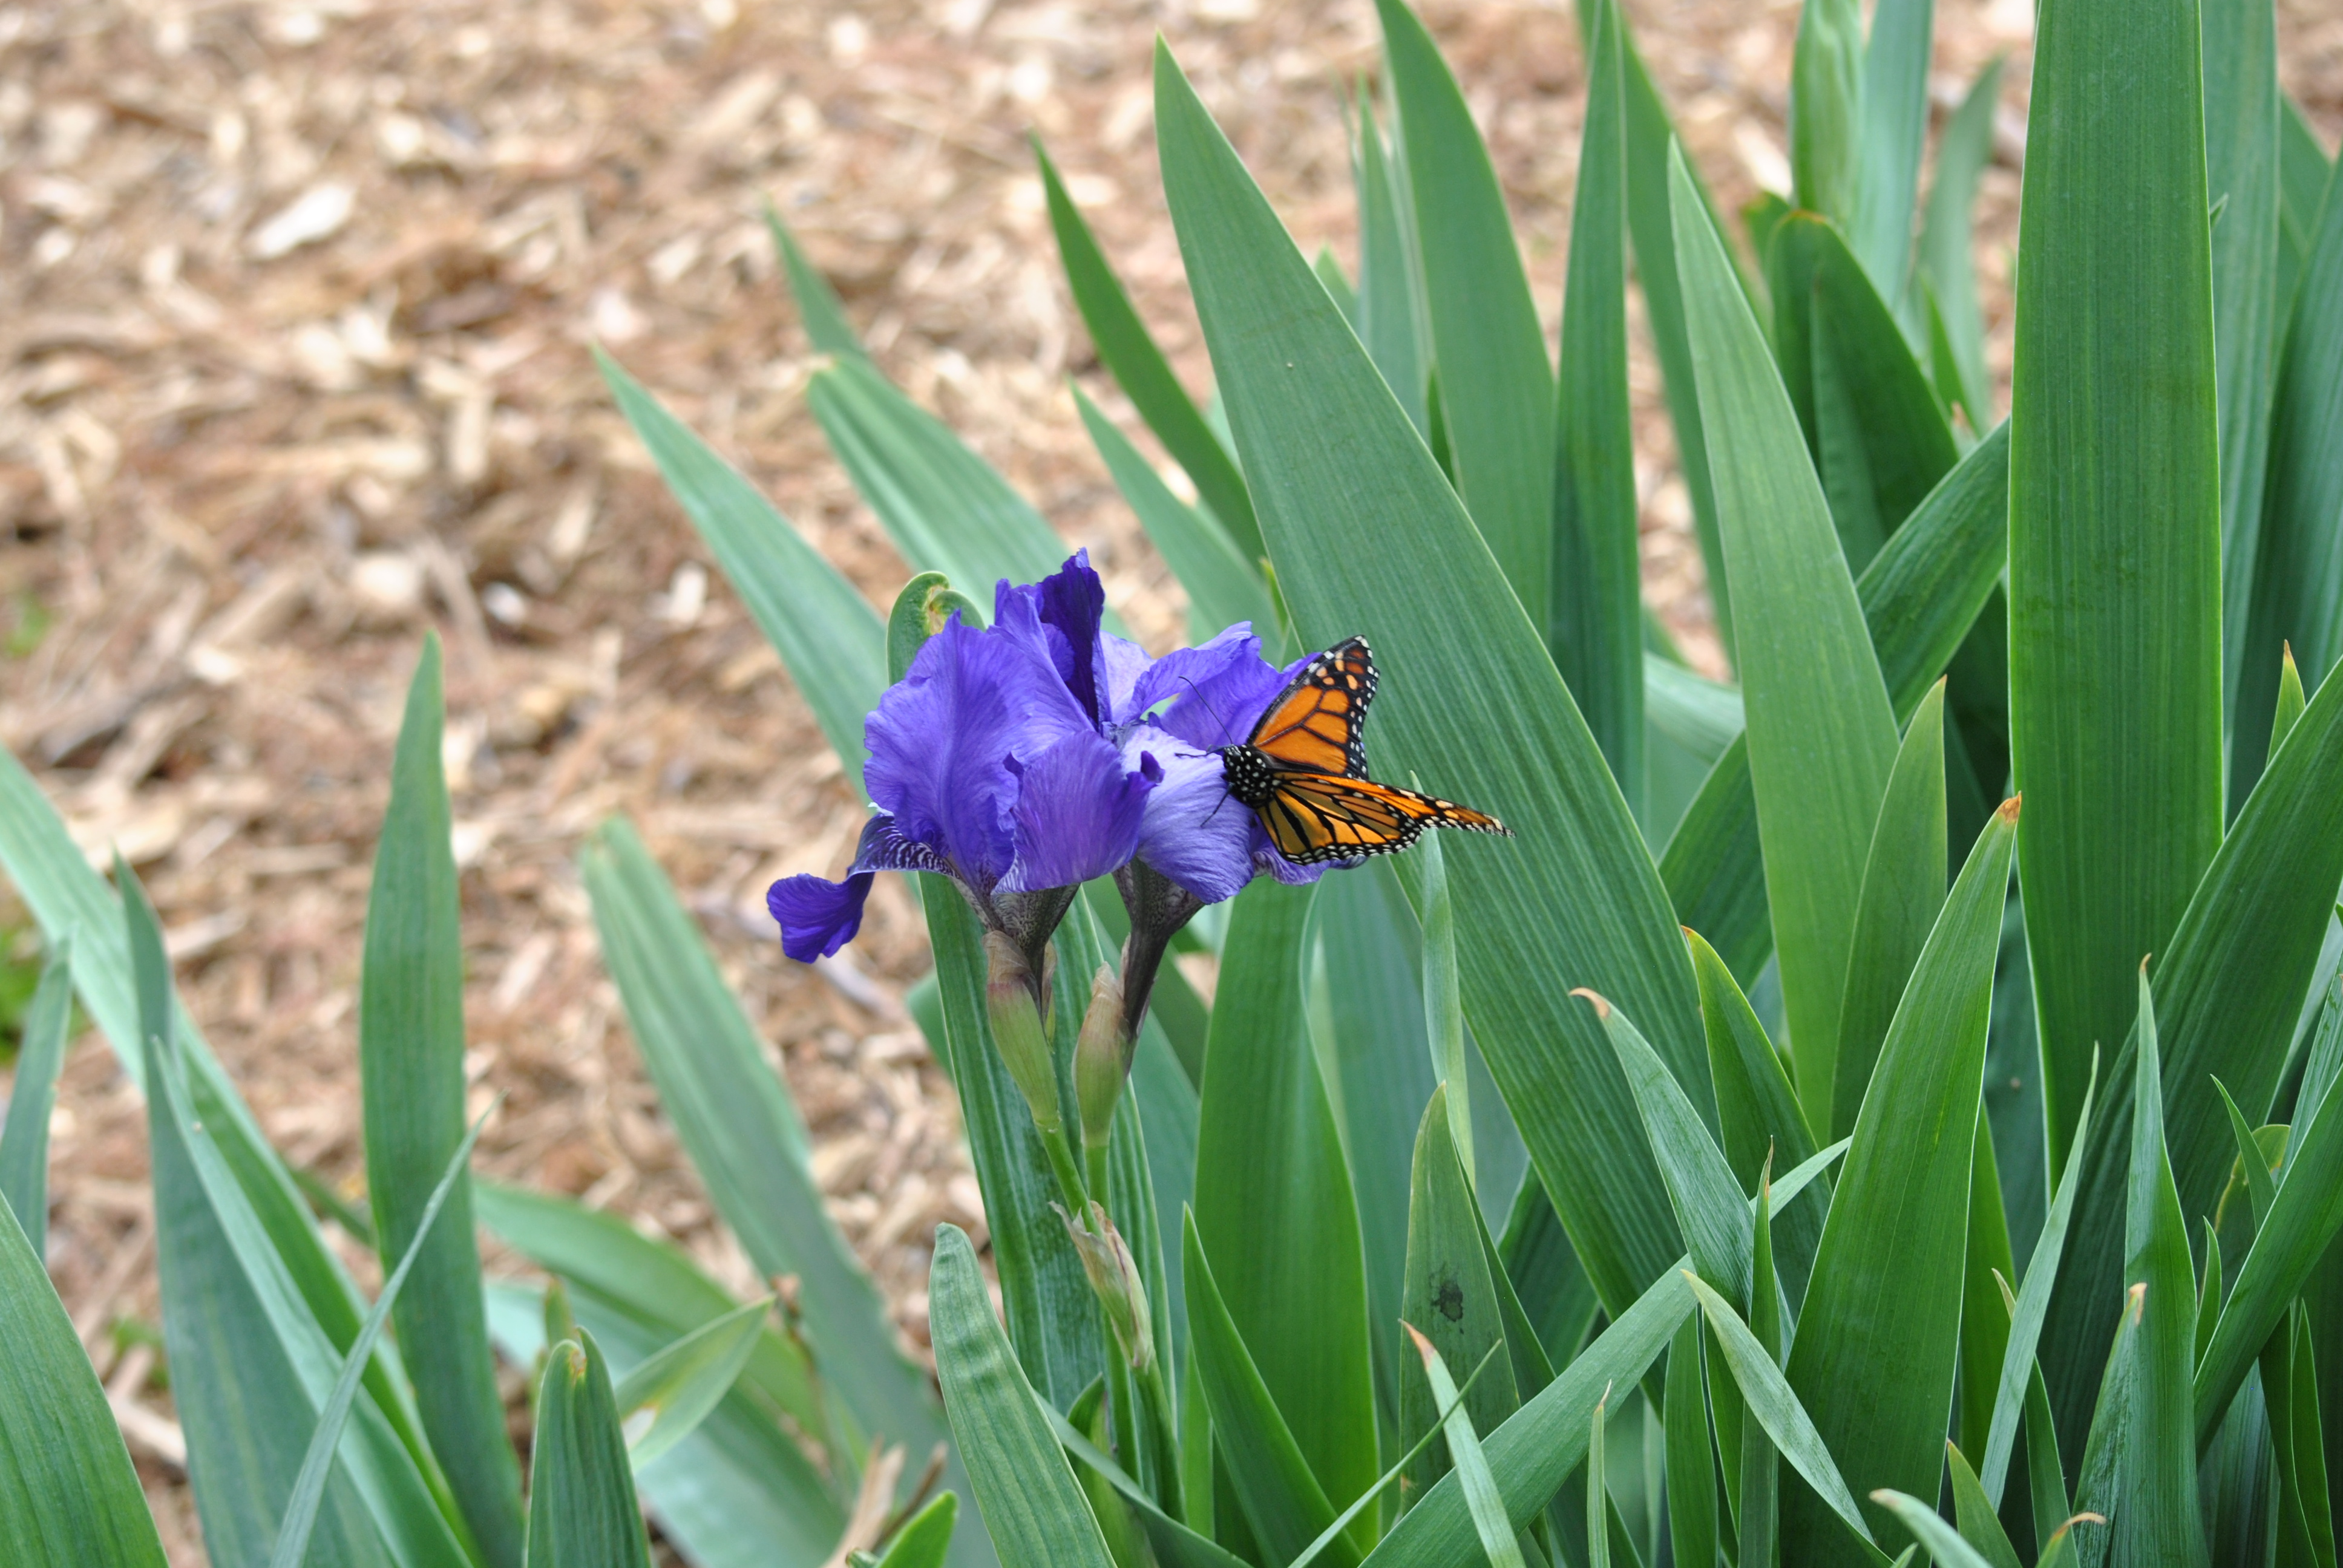 Released_Butterfly